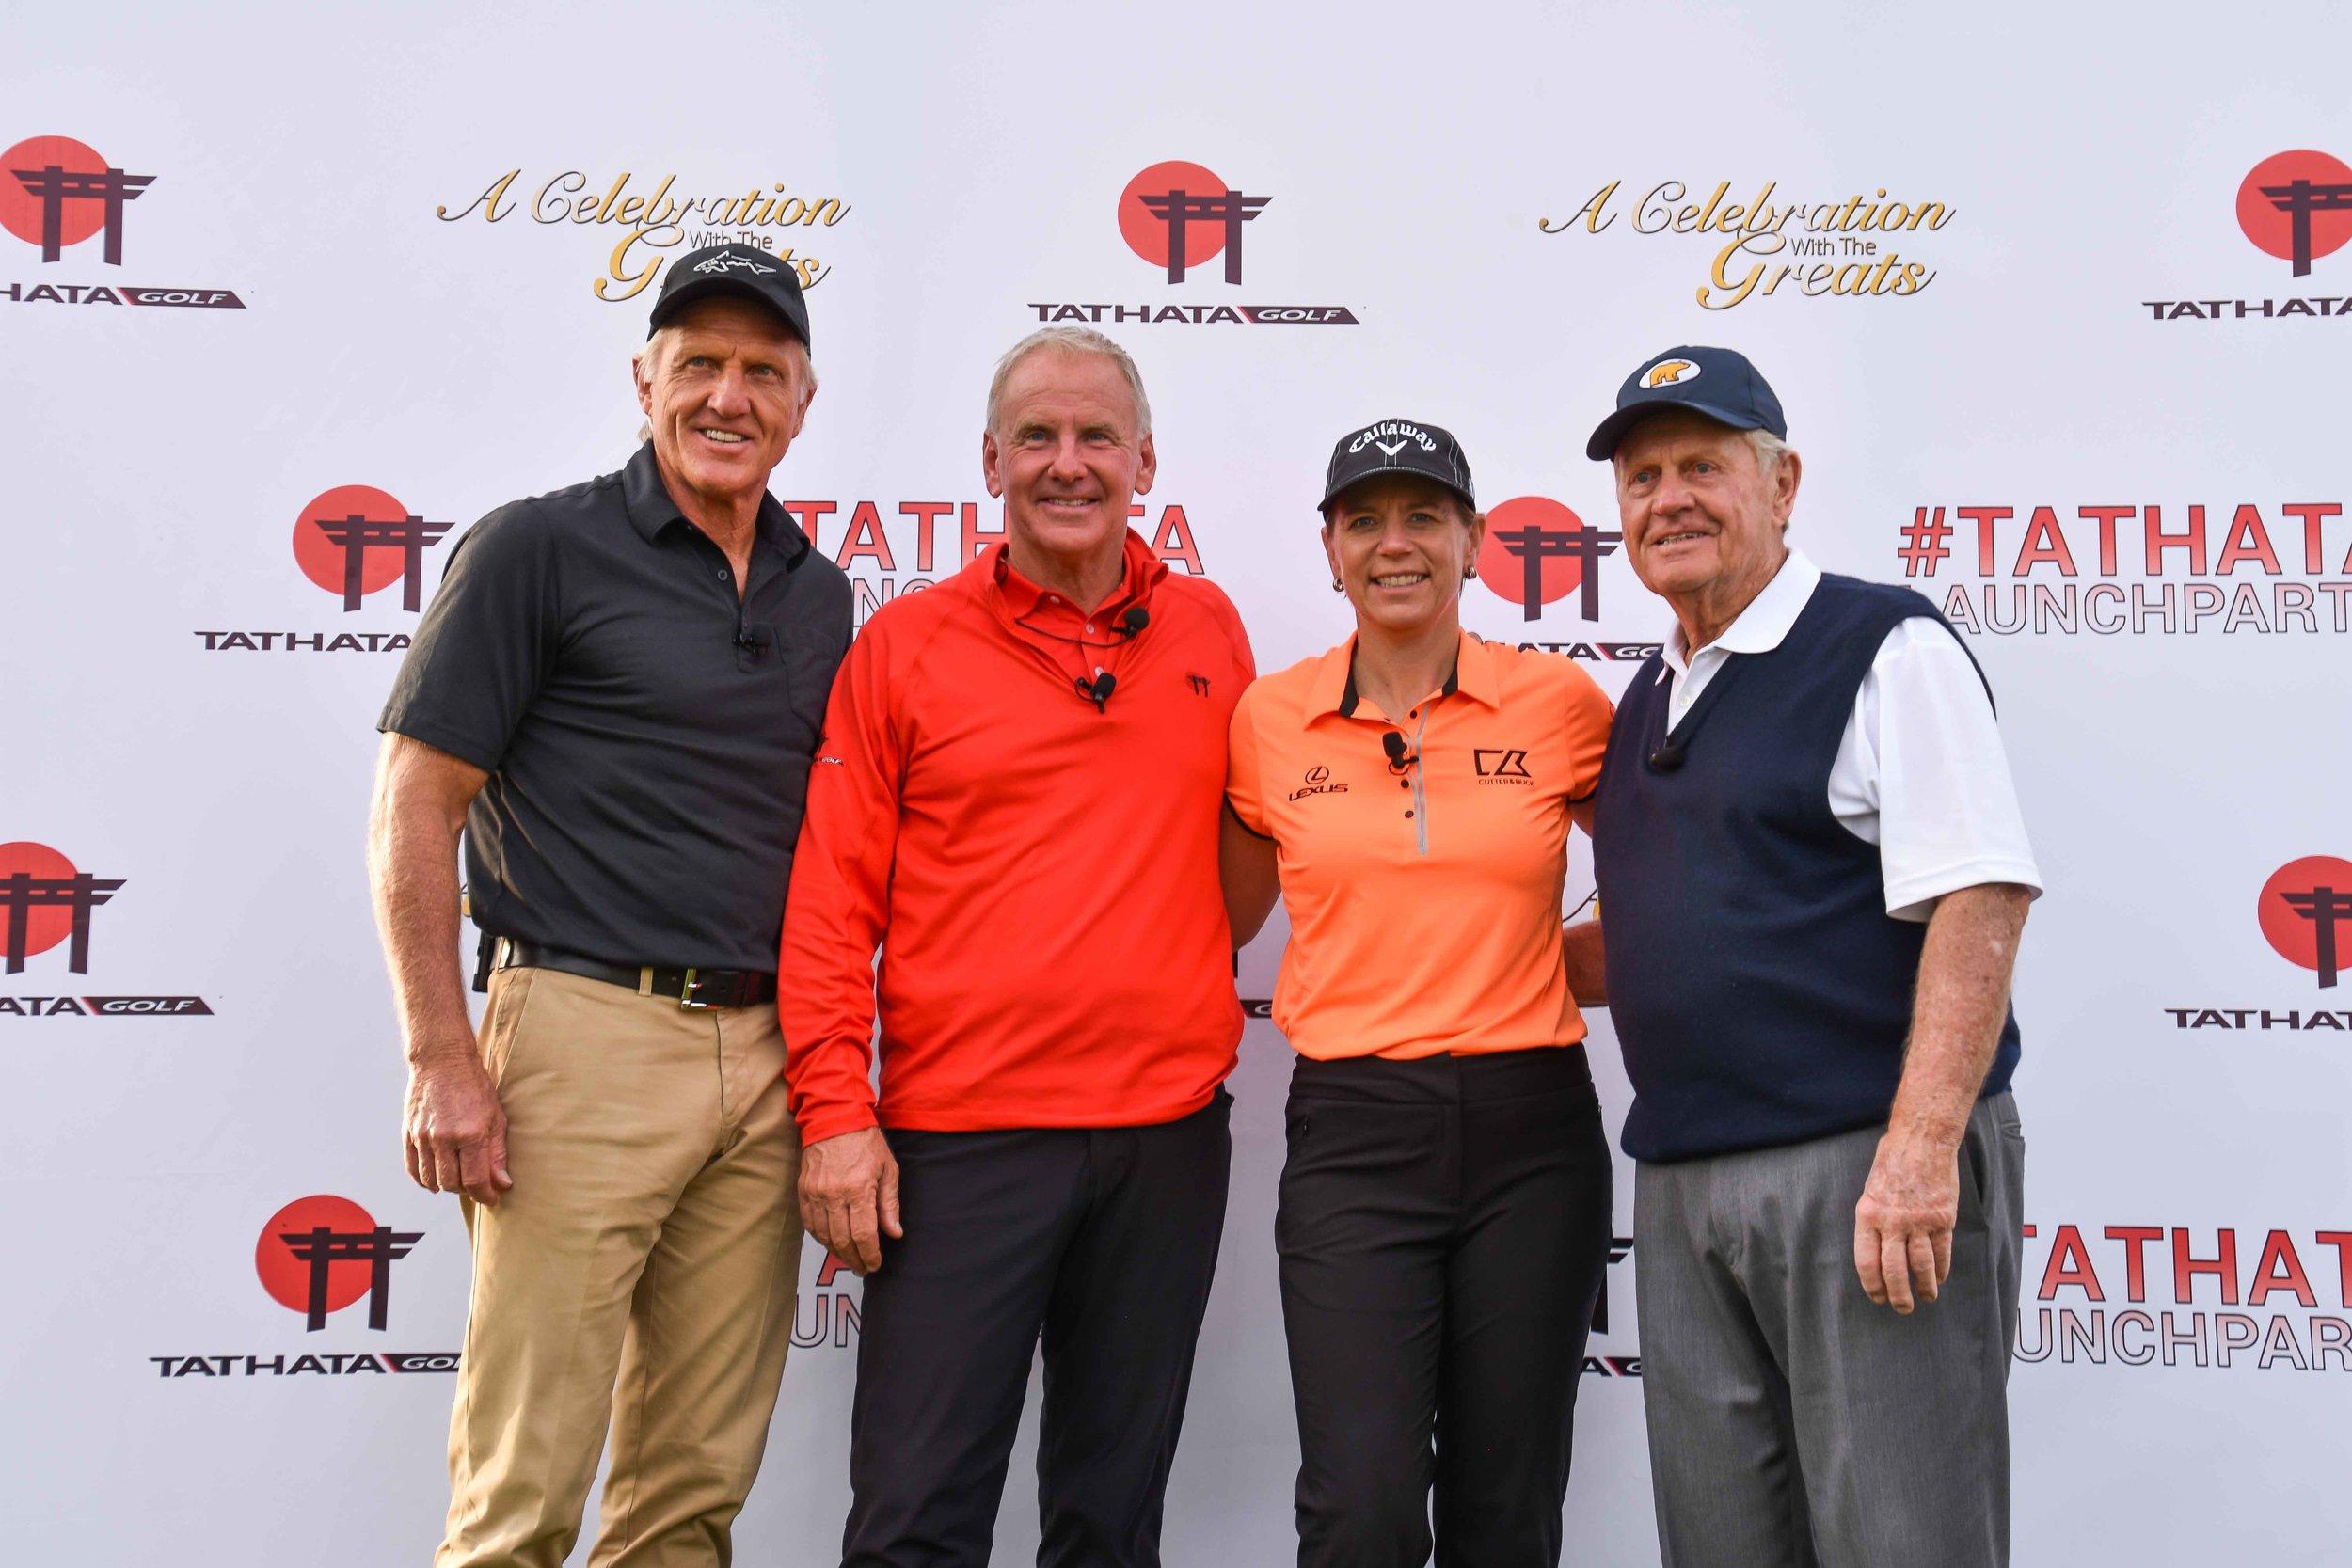 Greg, Annika, and Jack pose along side Bryan of Tathata Golf.